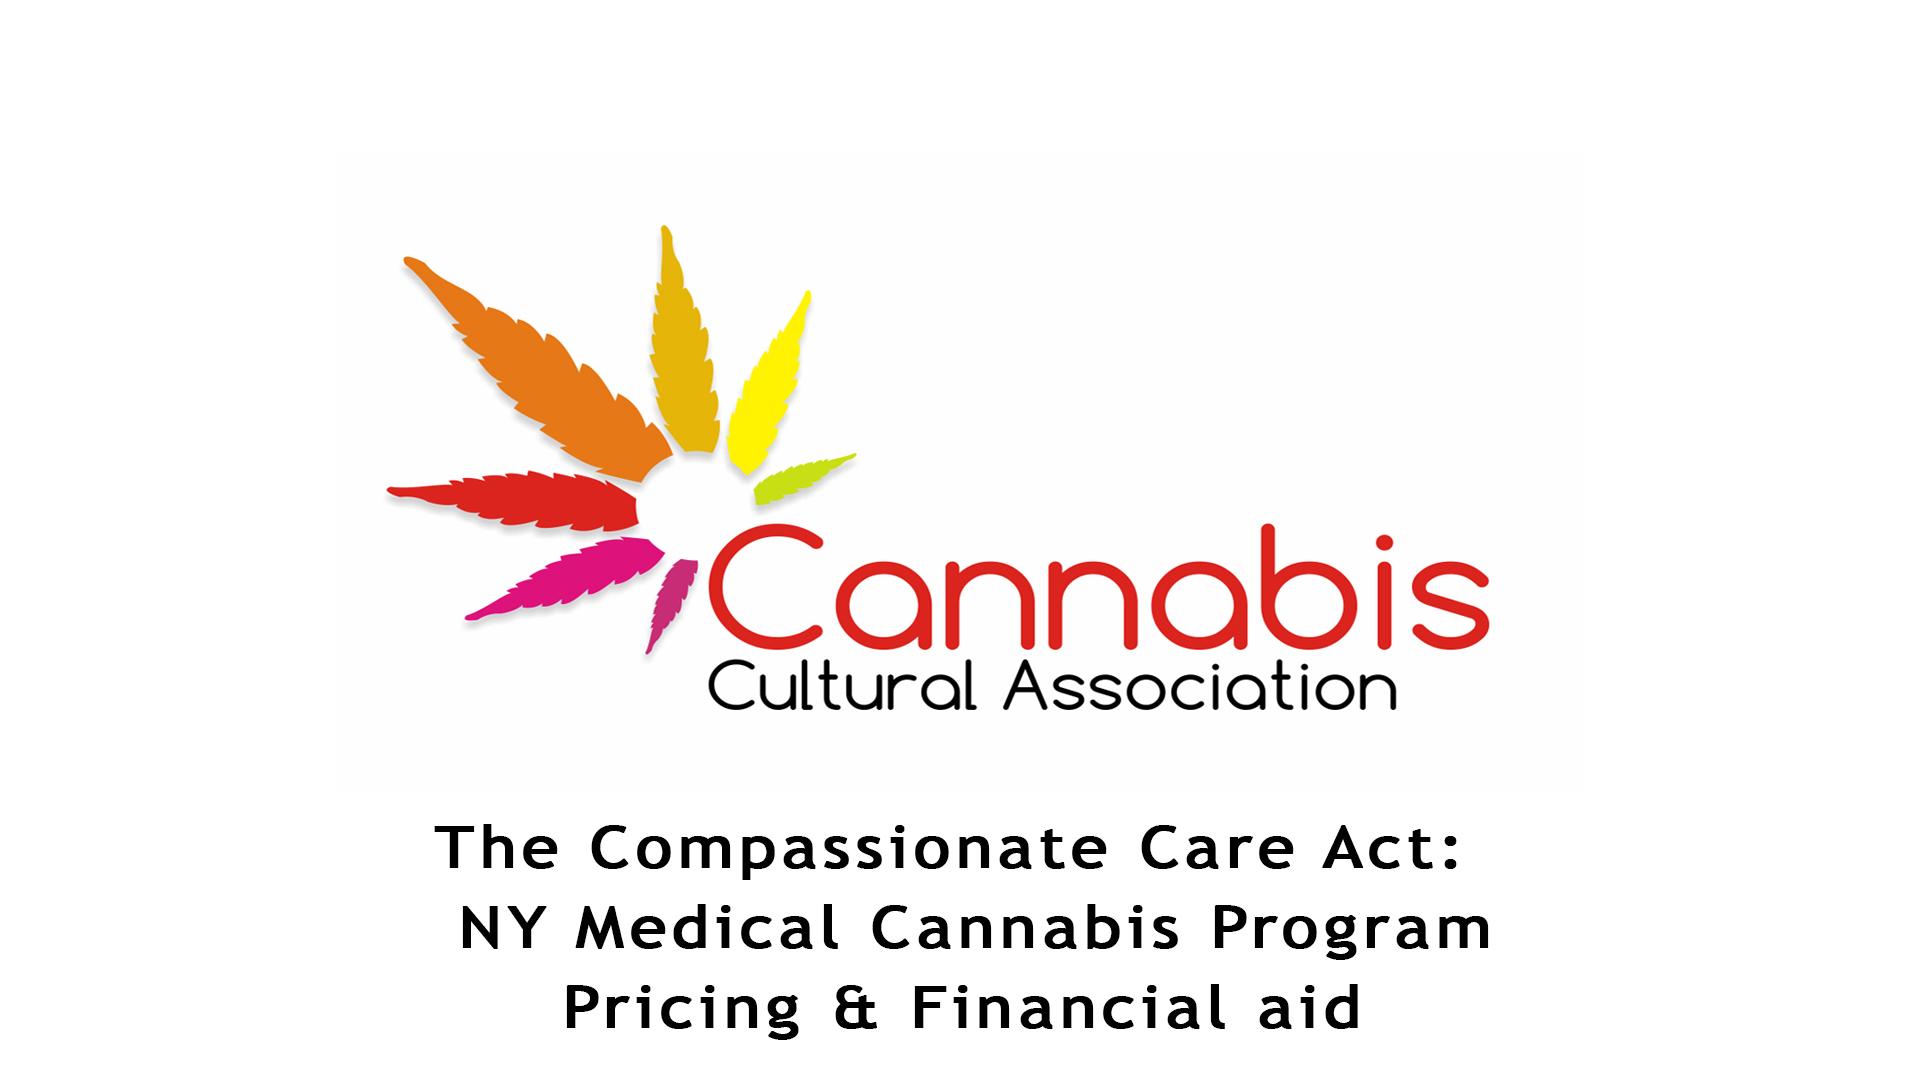 NY Medical Cannabis Program Pricing & Financial aid